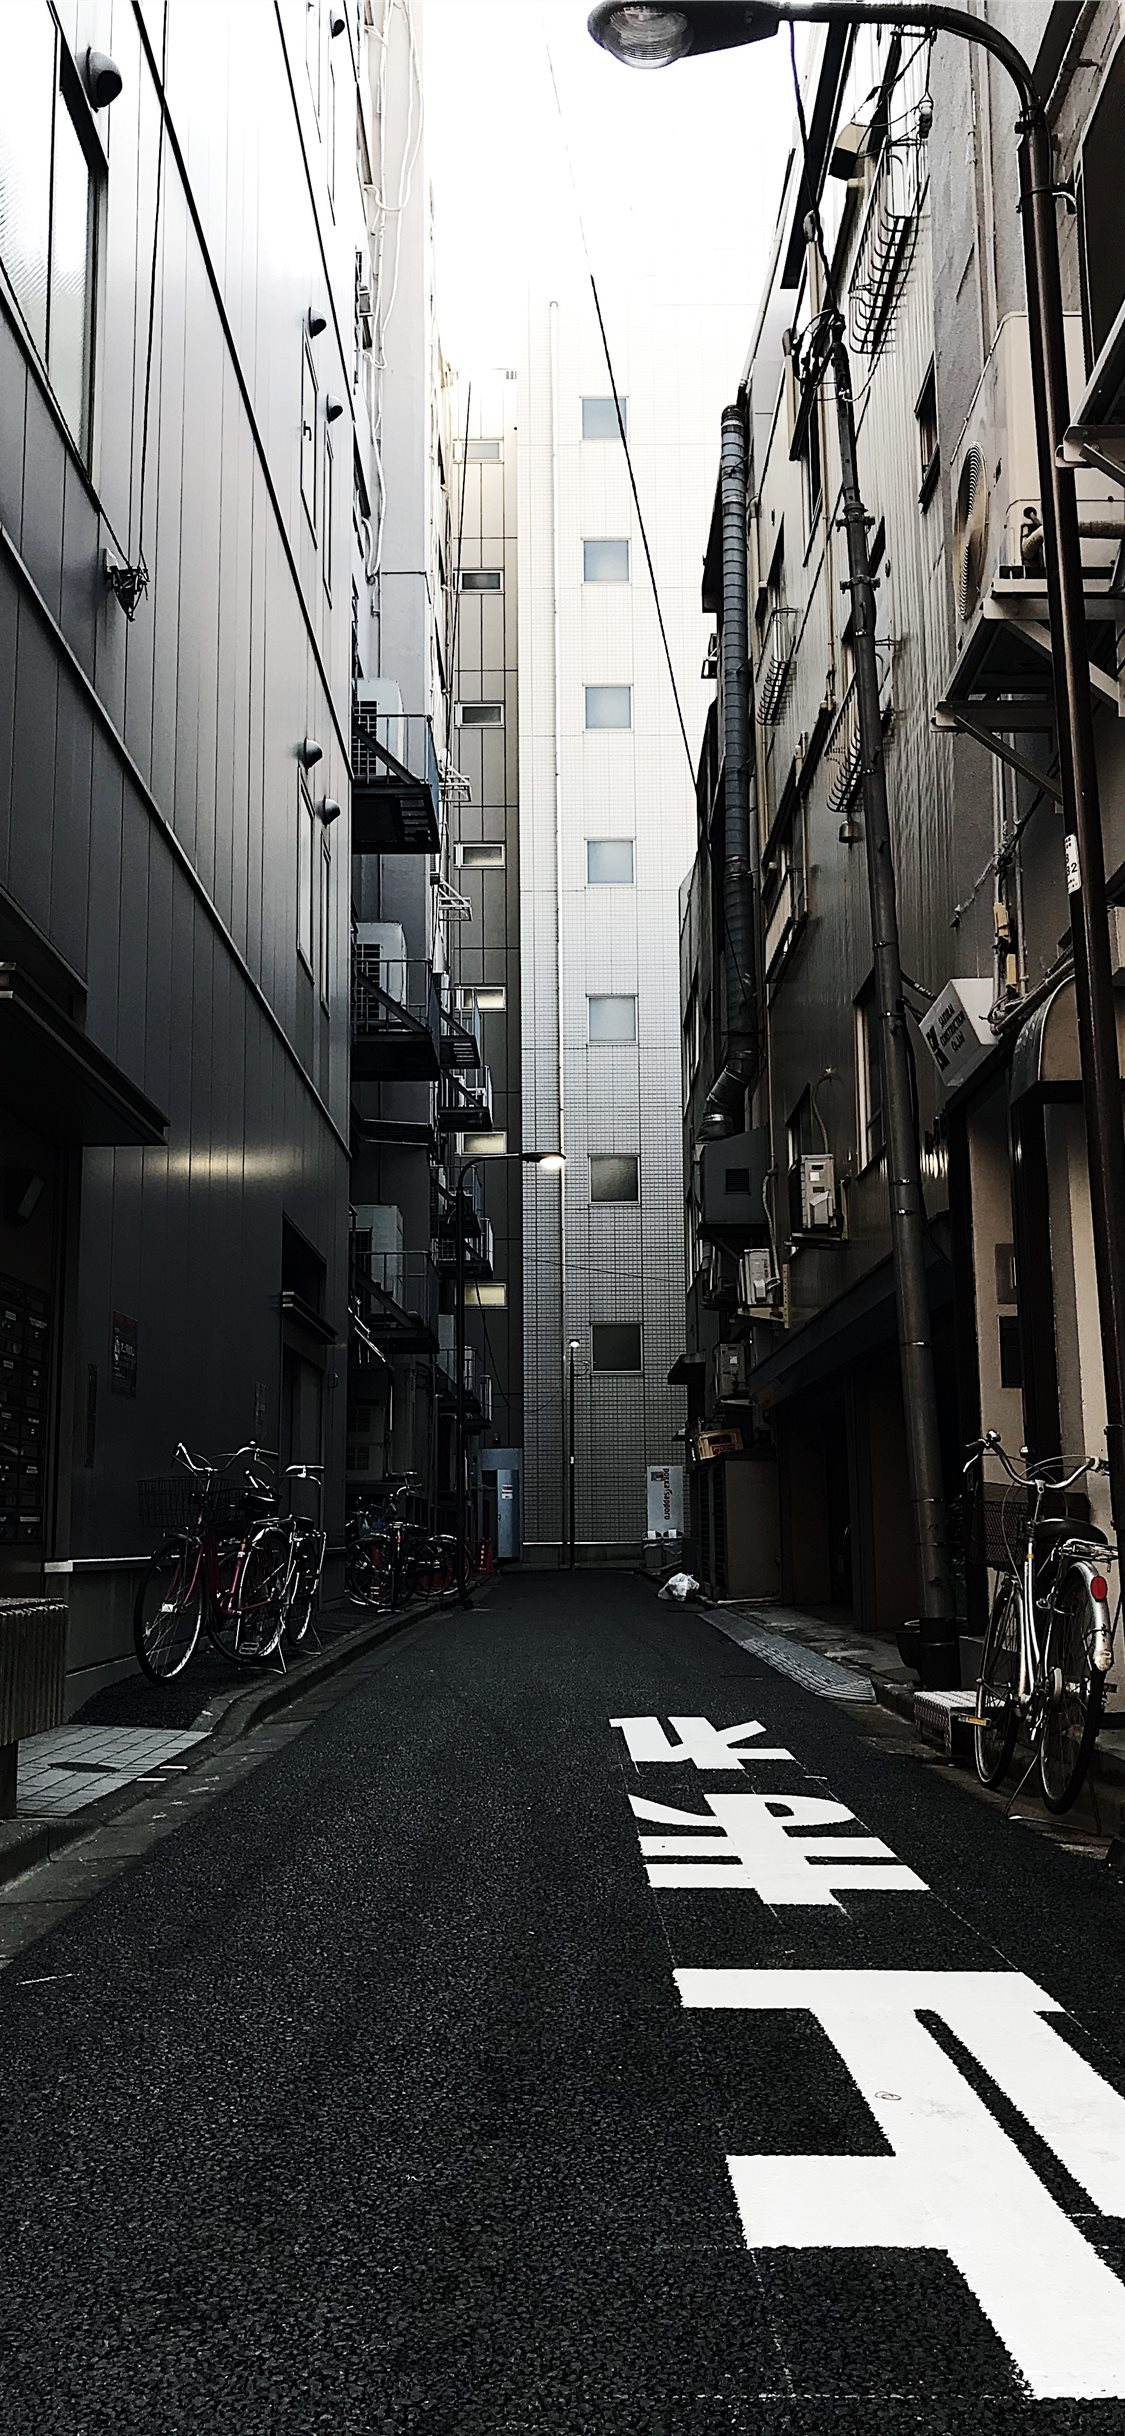 Japanese Black Wallpaper Iphone 1125x2436 Wallpaper Teahub Io